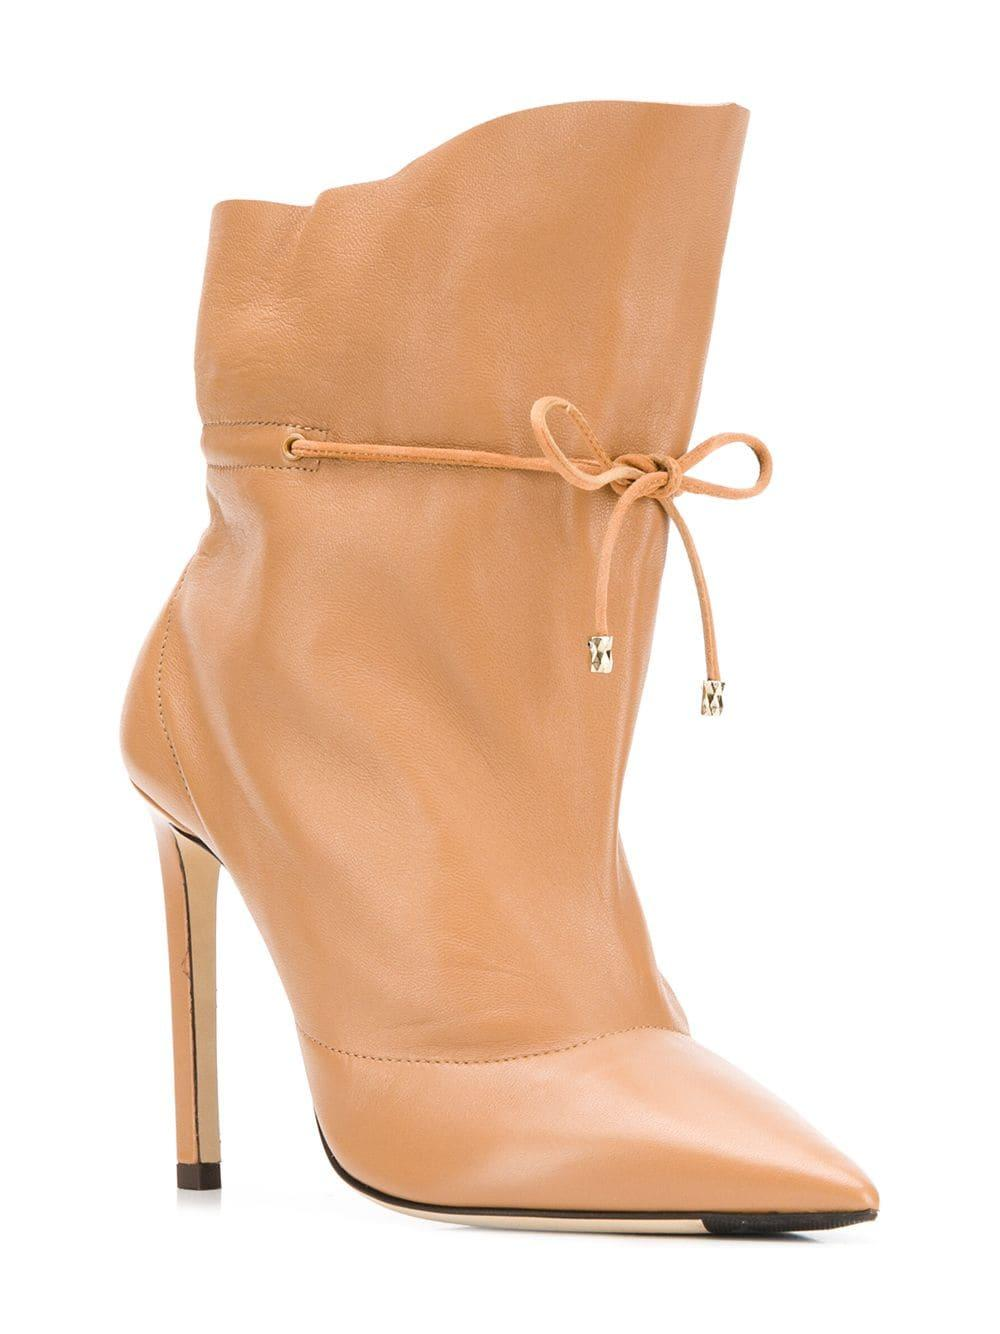 8c0e1af5eeea Jimmy Choo Stitch Ankle Boots - Lyst